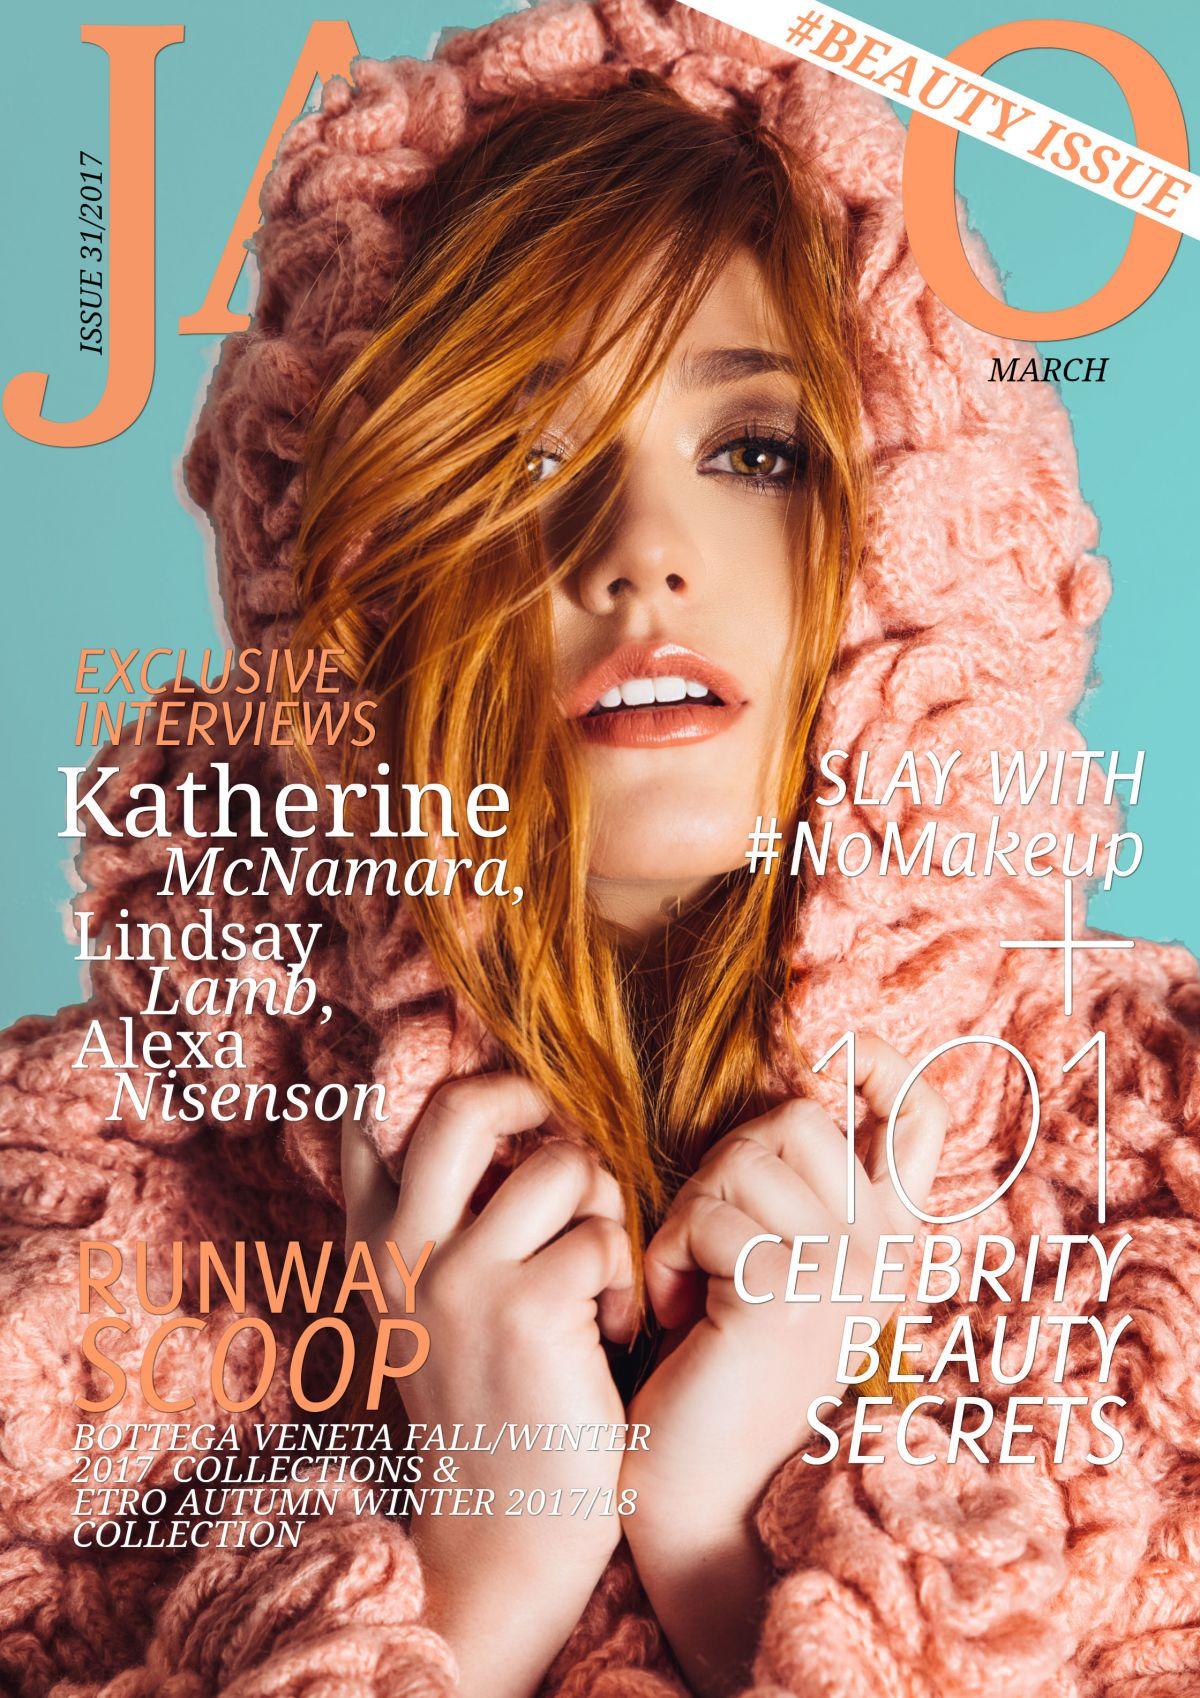 KATHERINE MCNAMARA for Jamo Magazine, March 2017